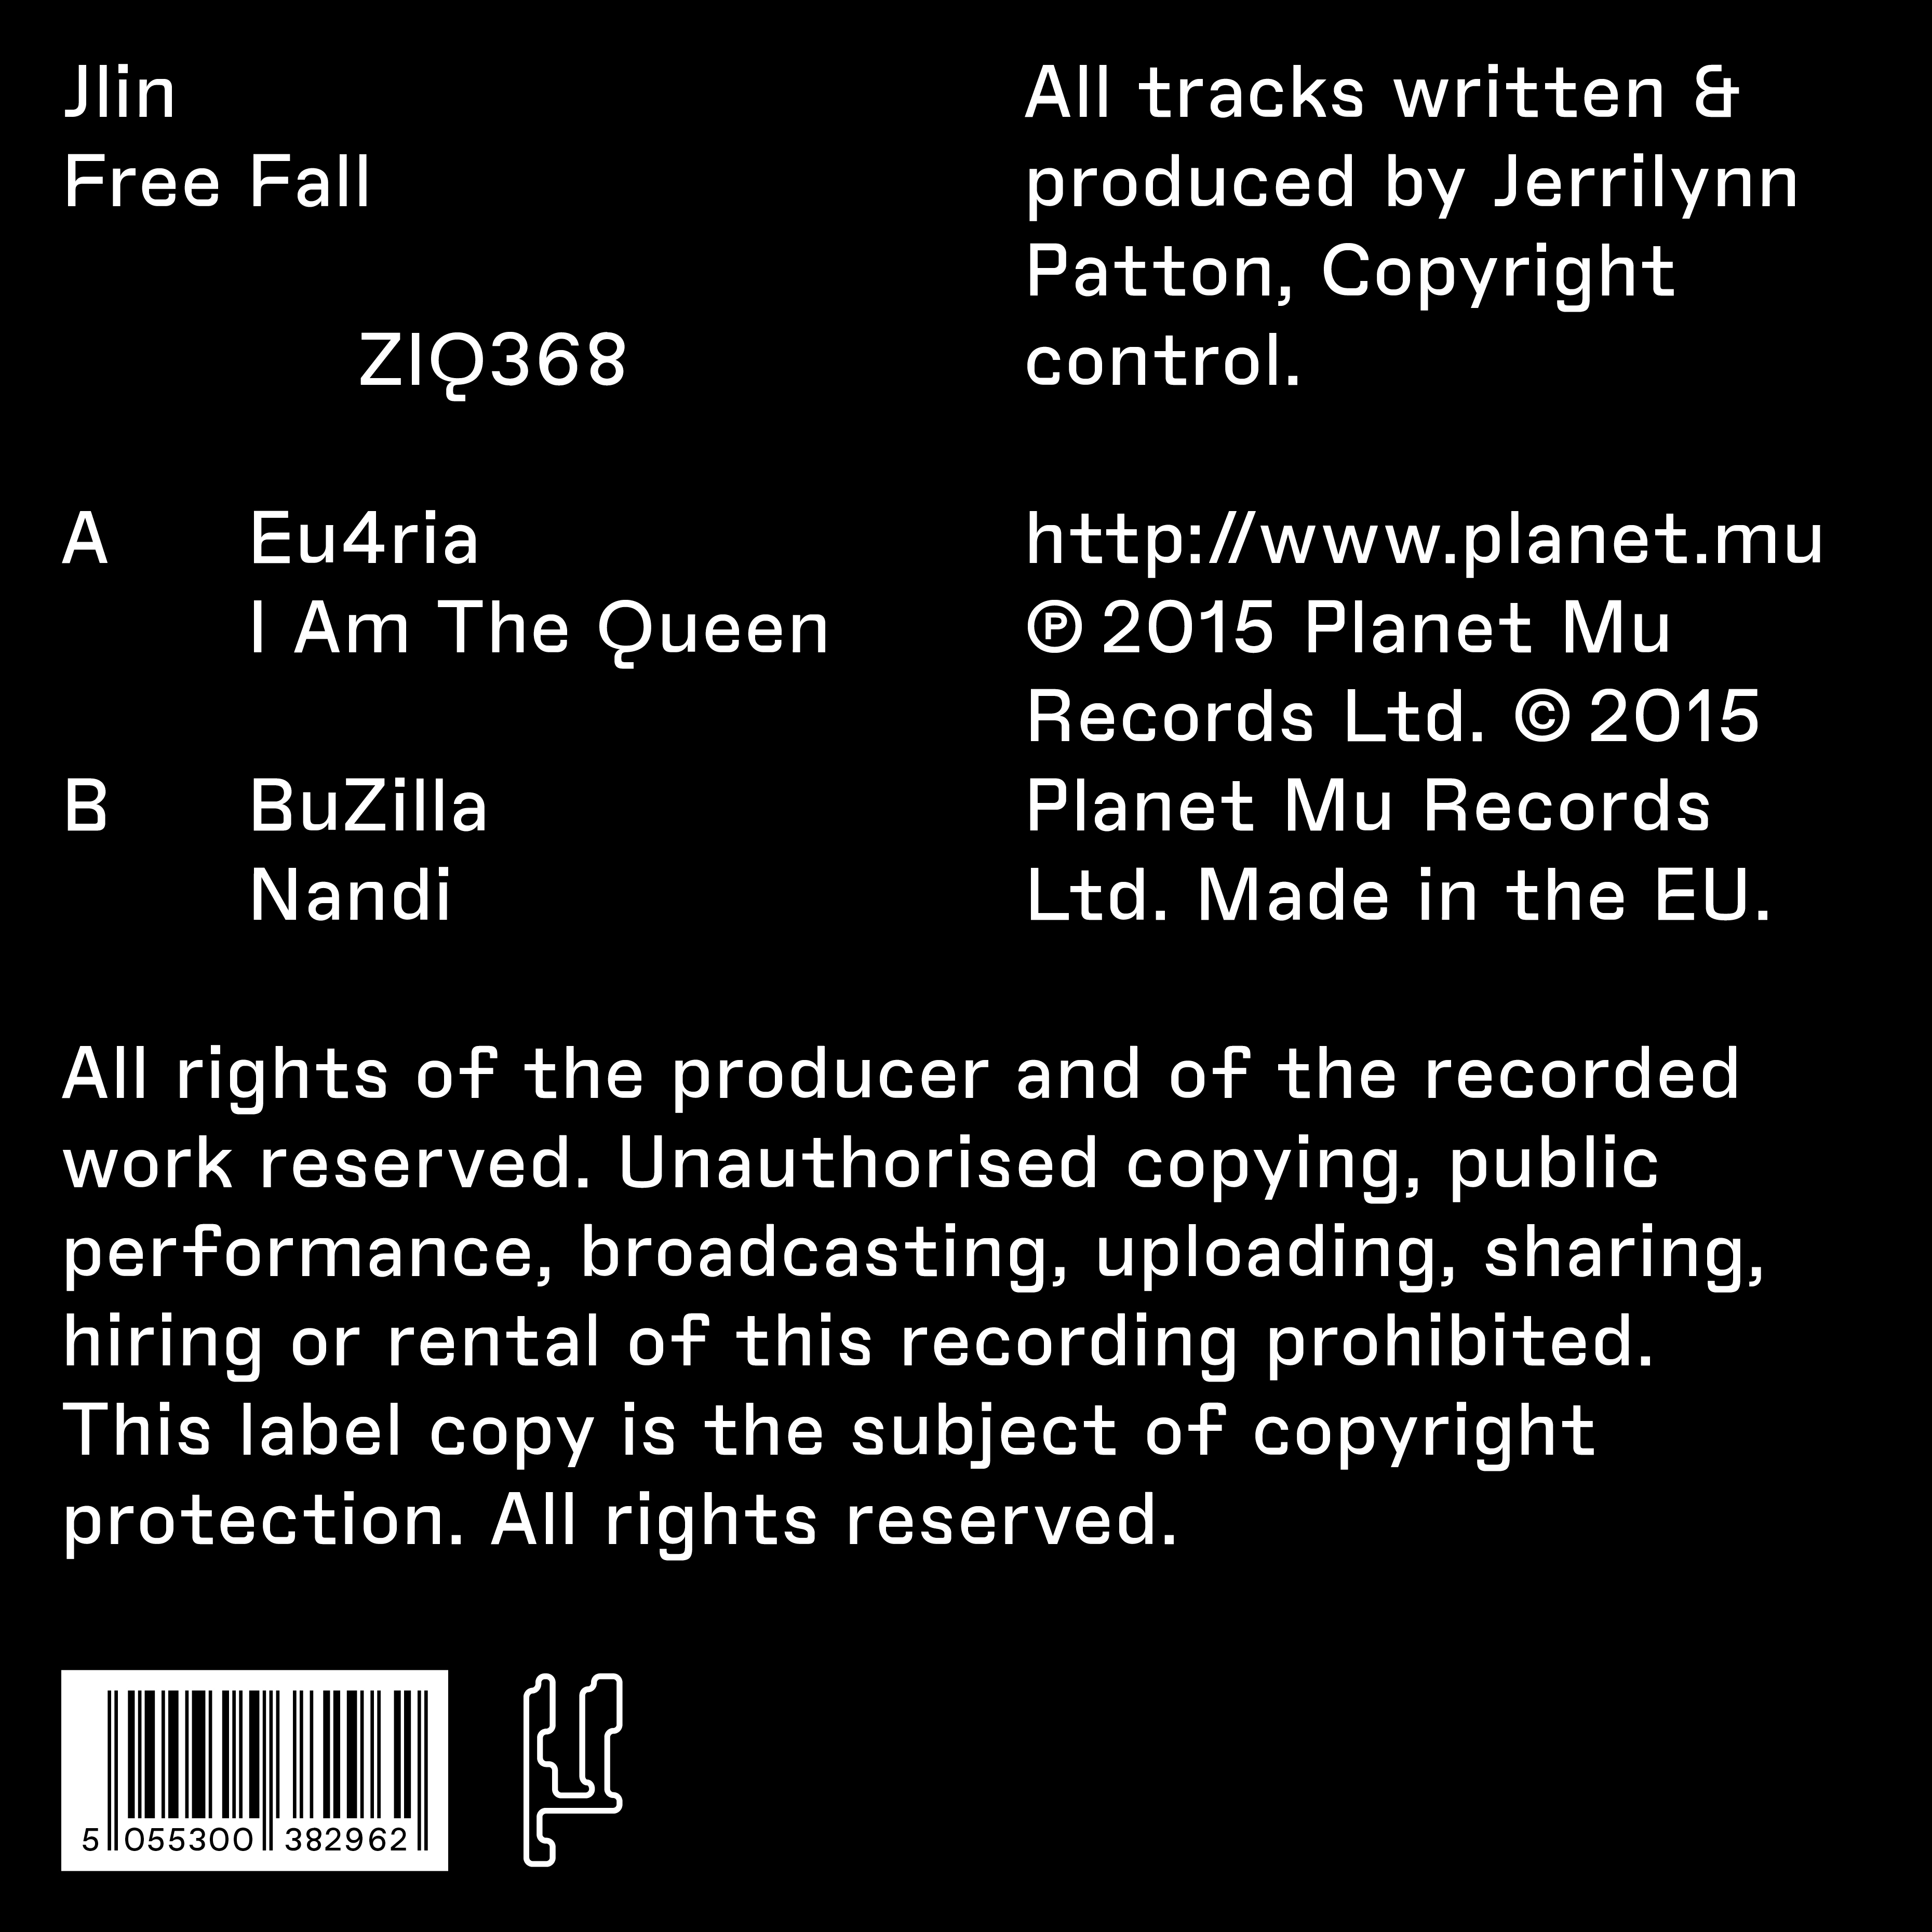 ZIQ368_Jlin_FreeFall